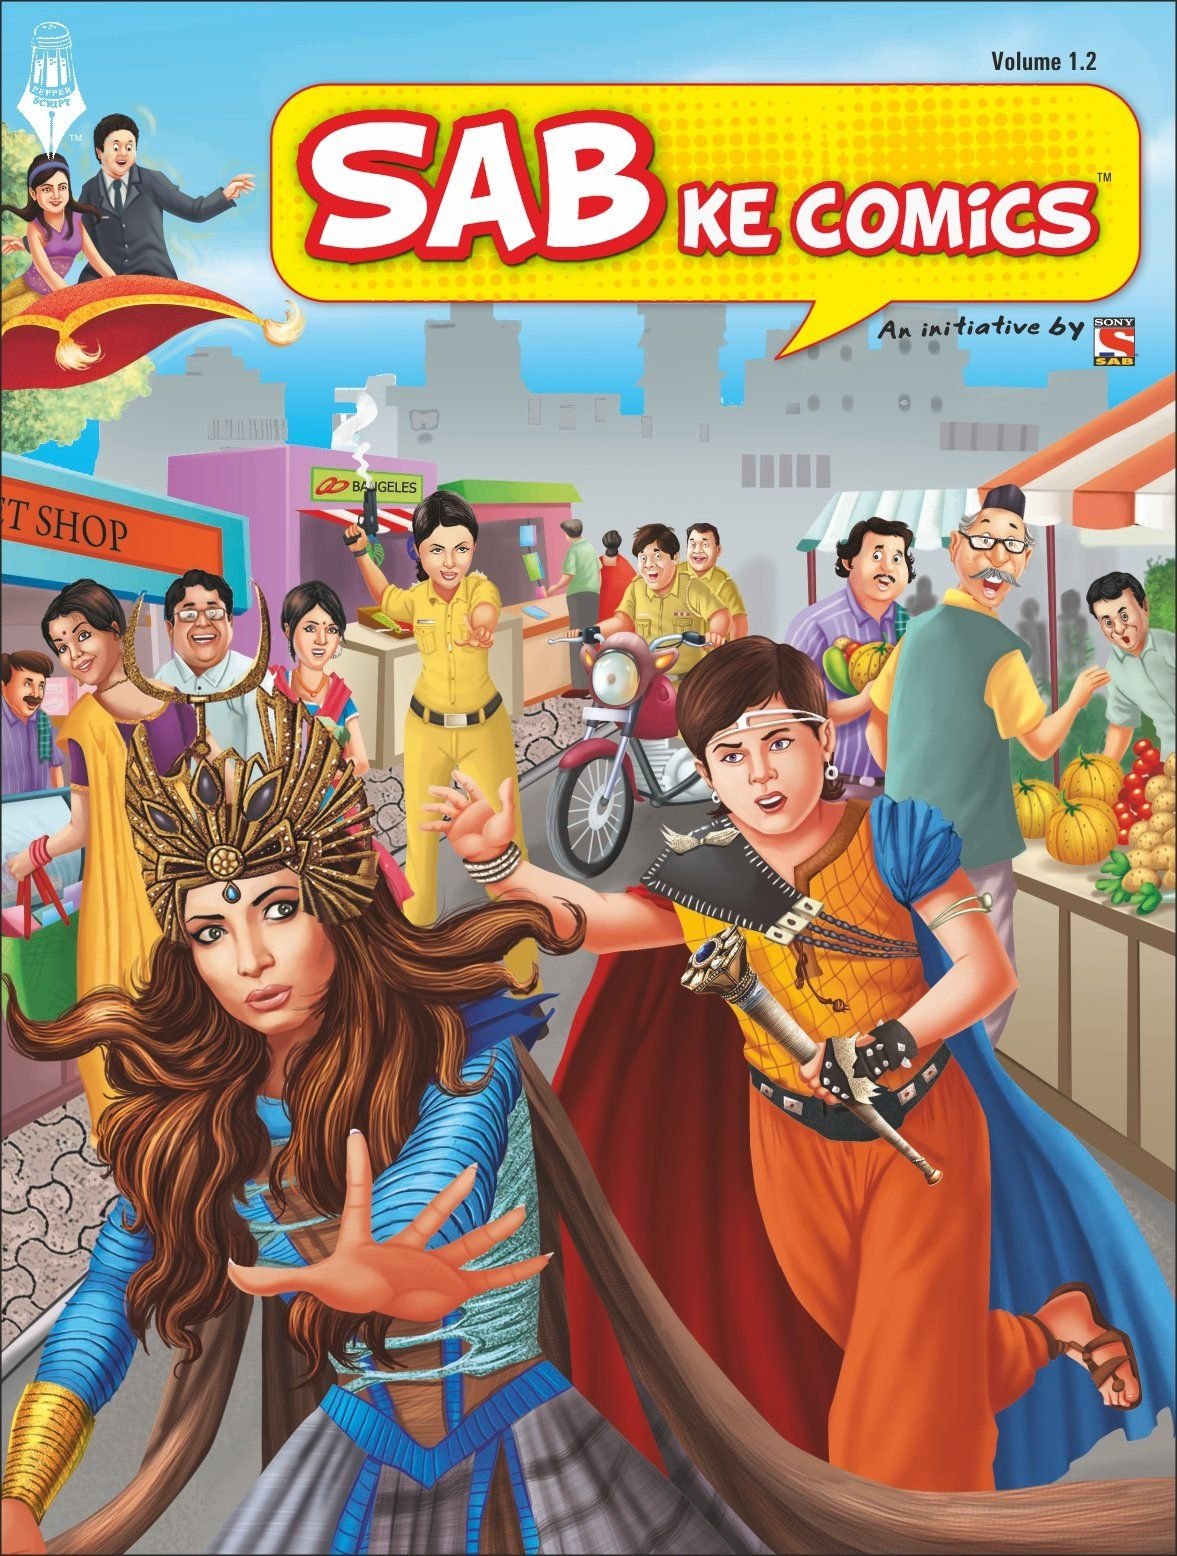 Sab ke Comics (SAB TV) art cover